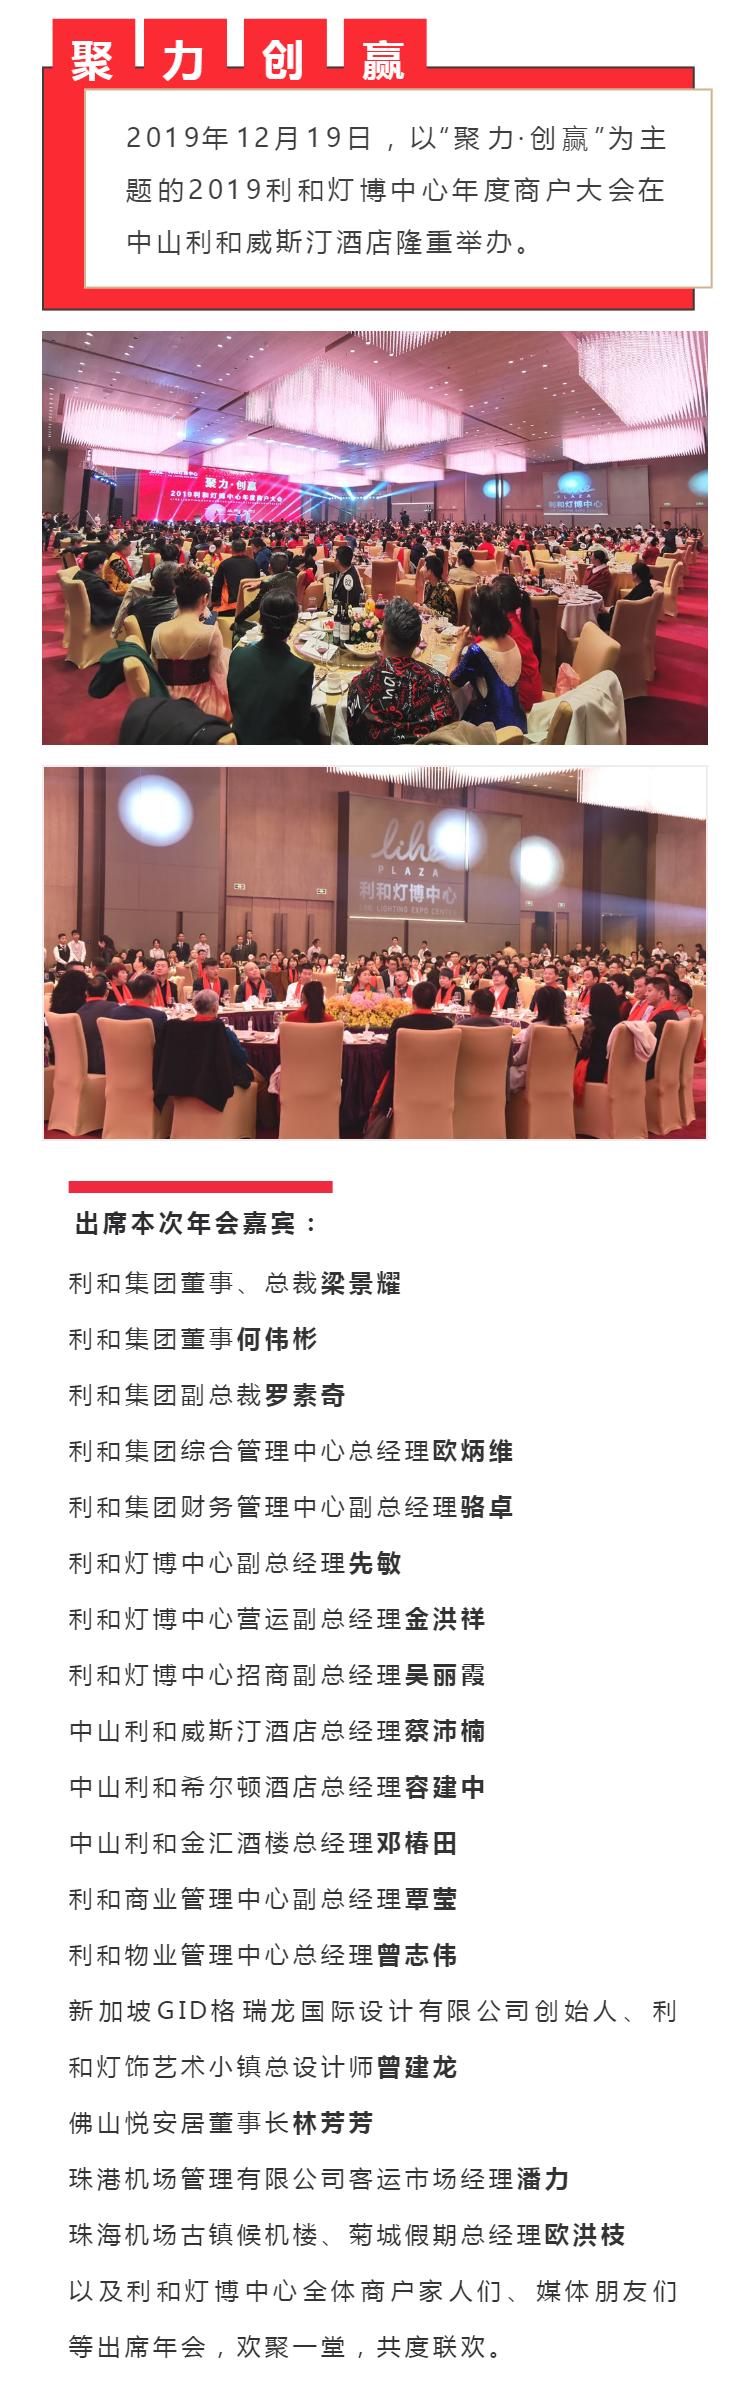 20191221_1717_yiban_screenshot_01.png